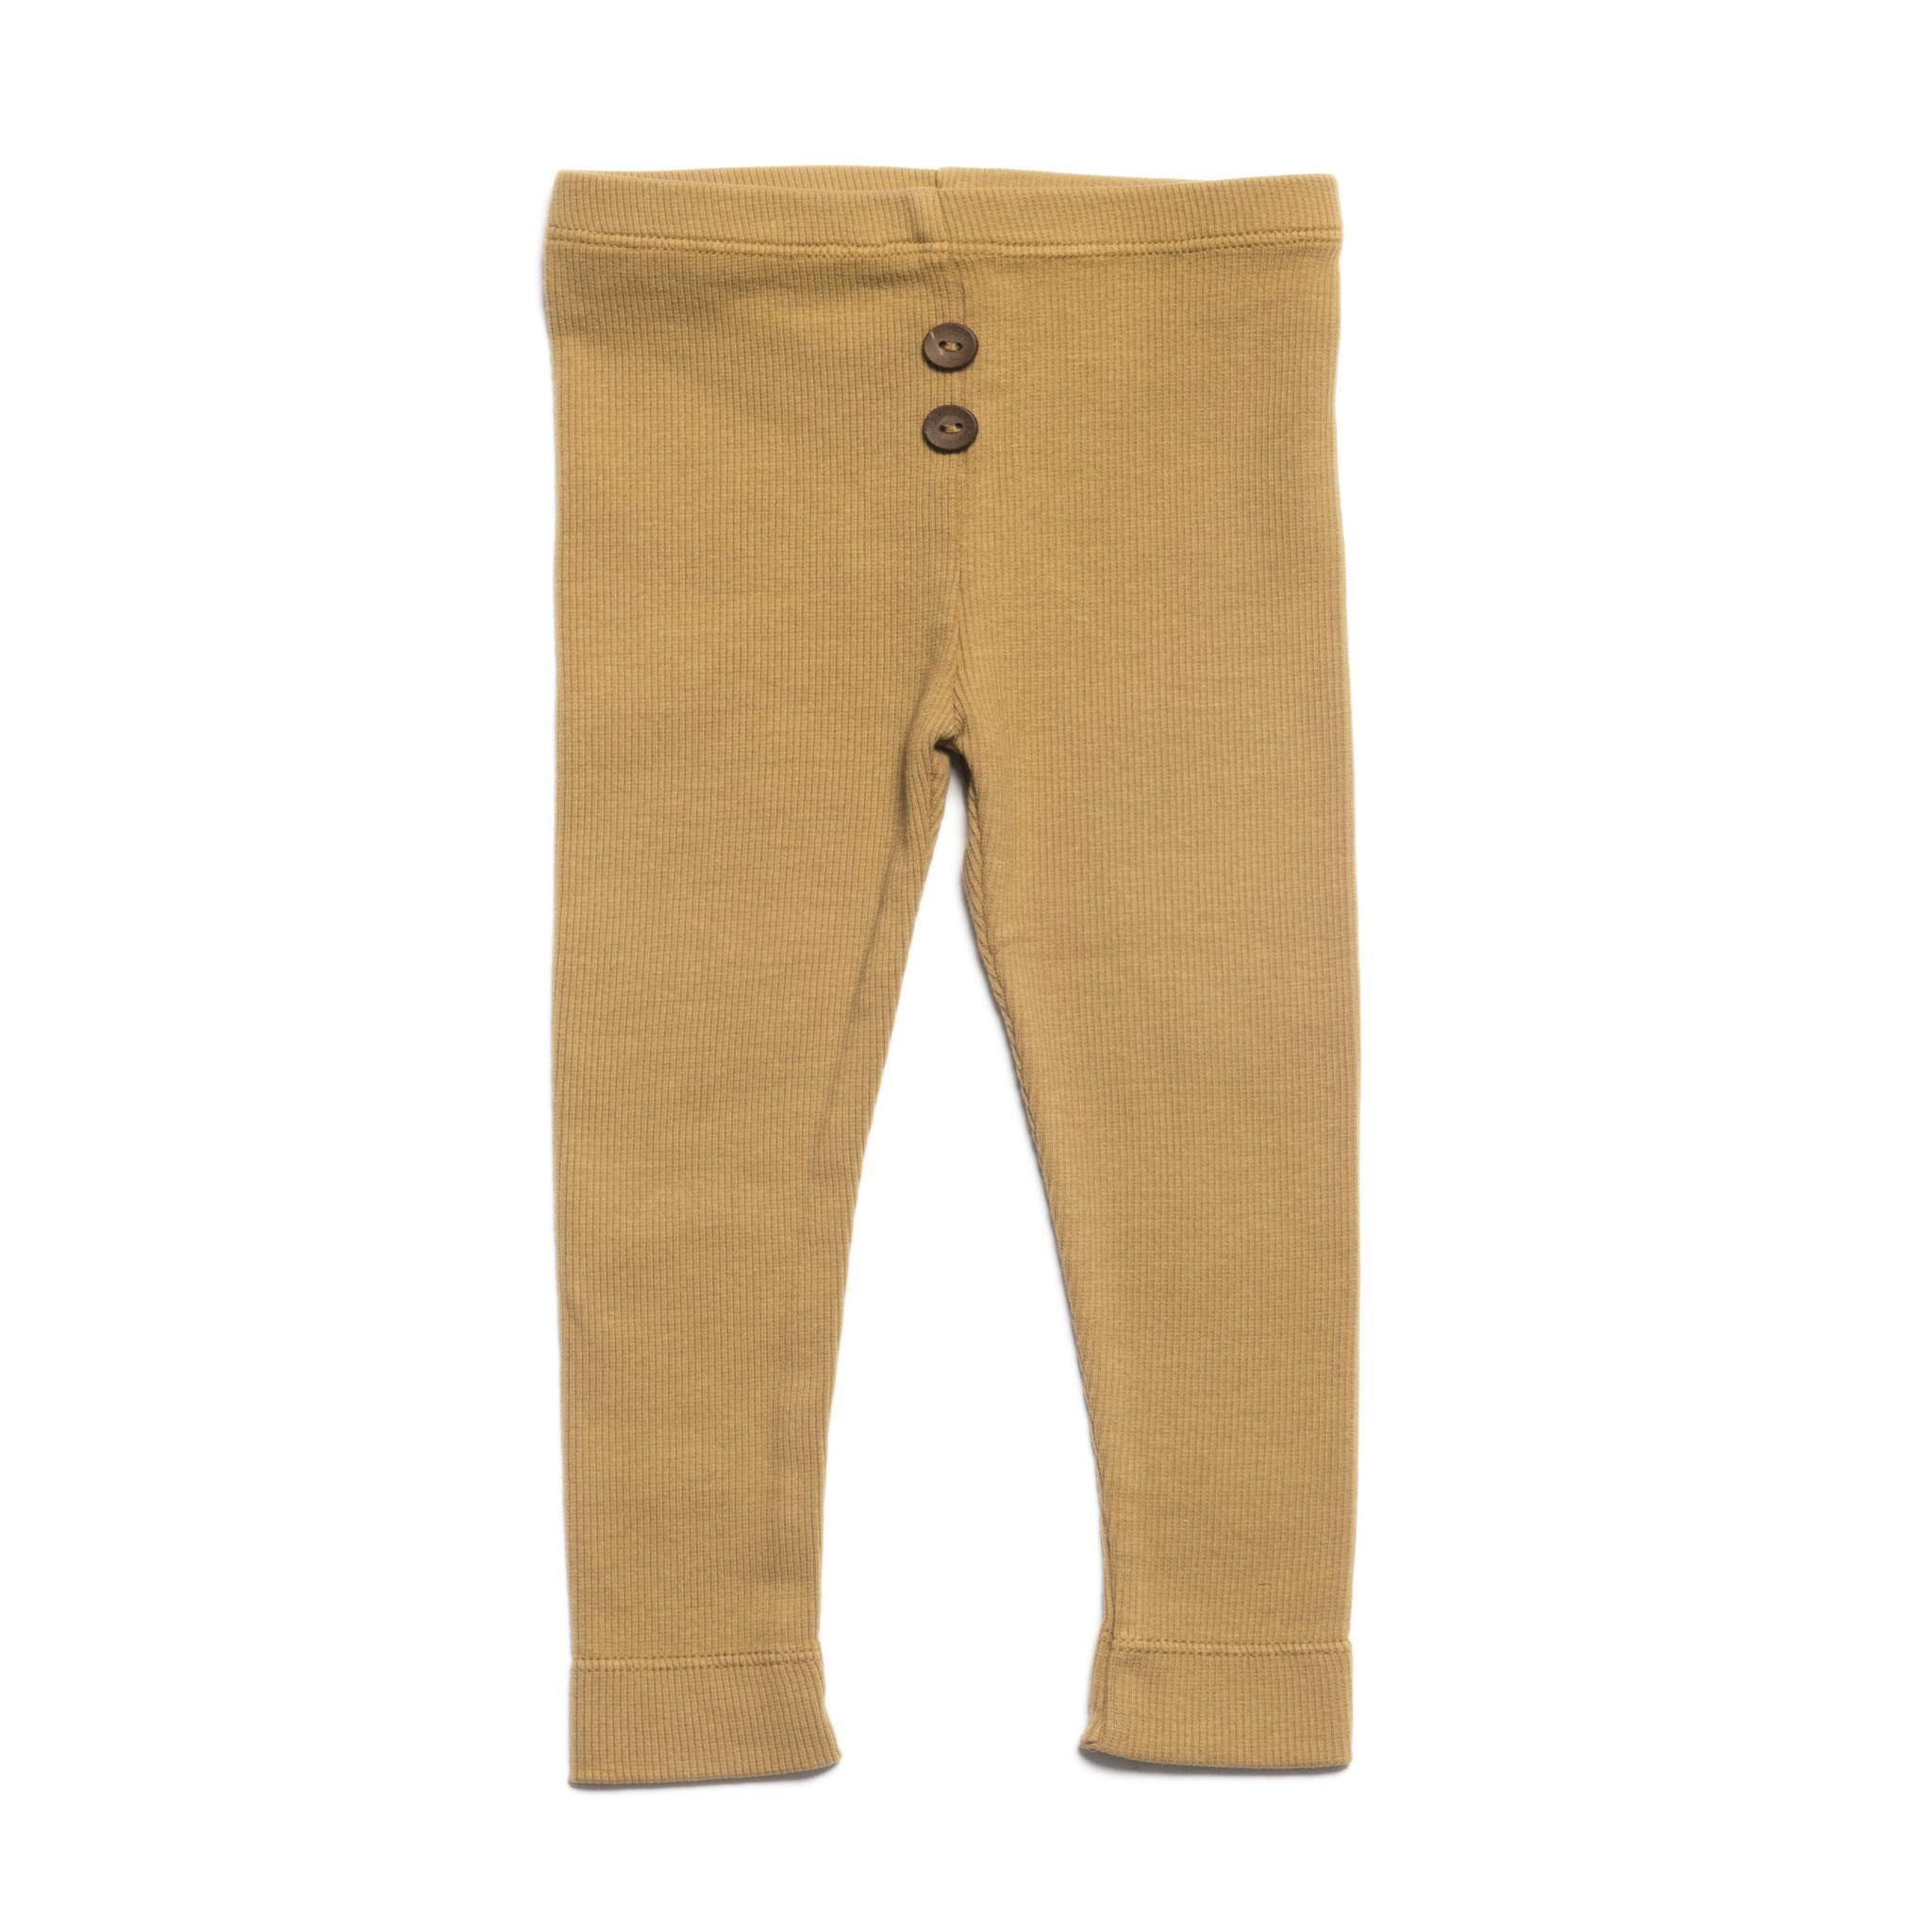 KidWild Vintage Leggings-Ochre